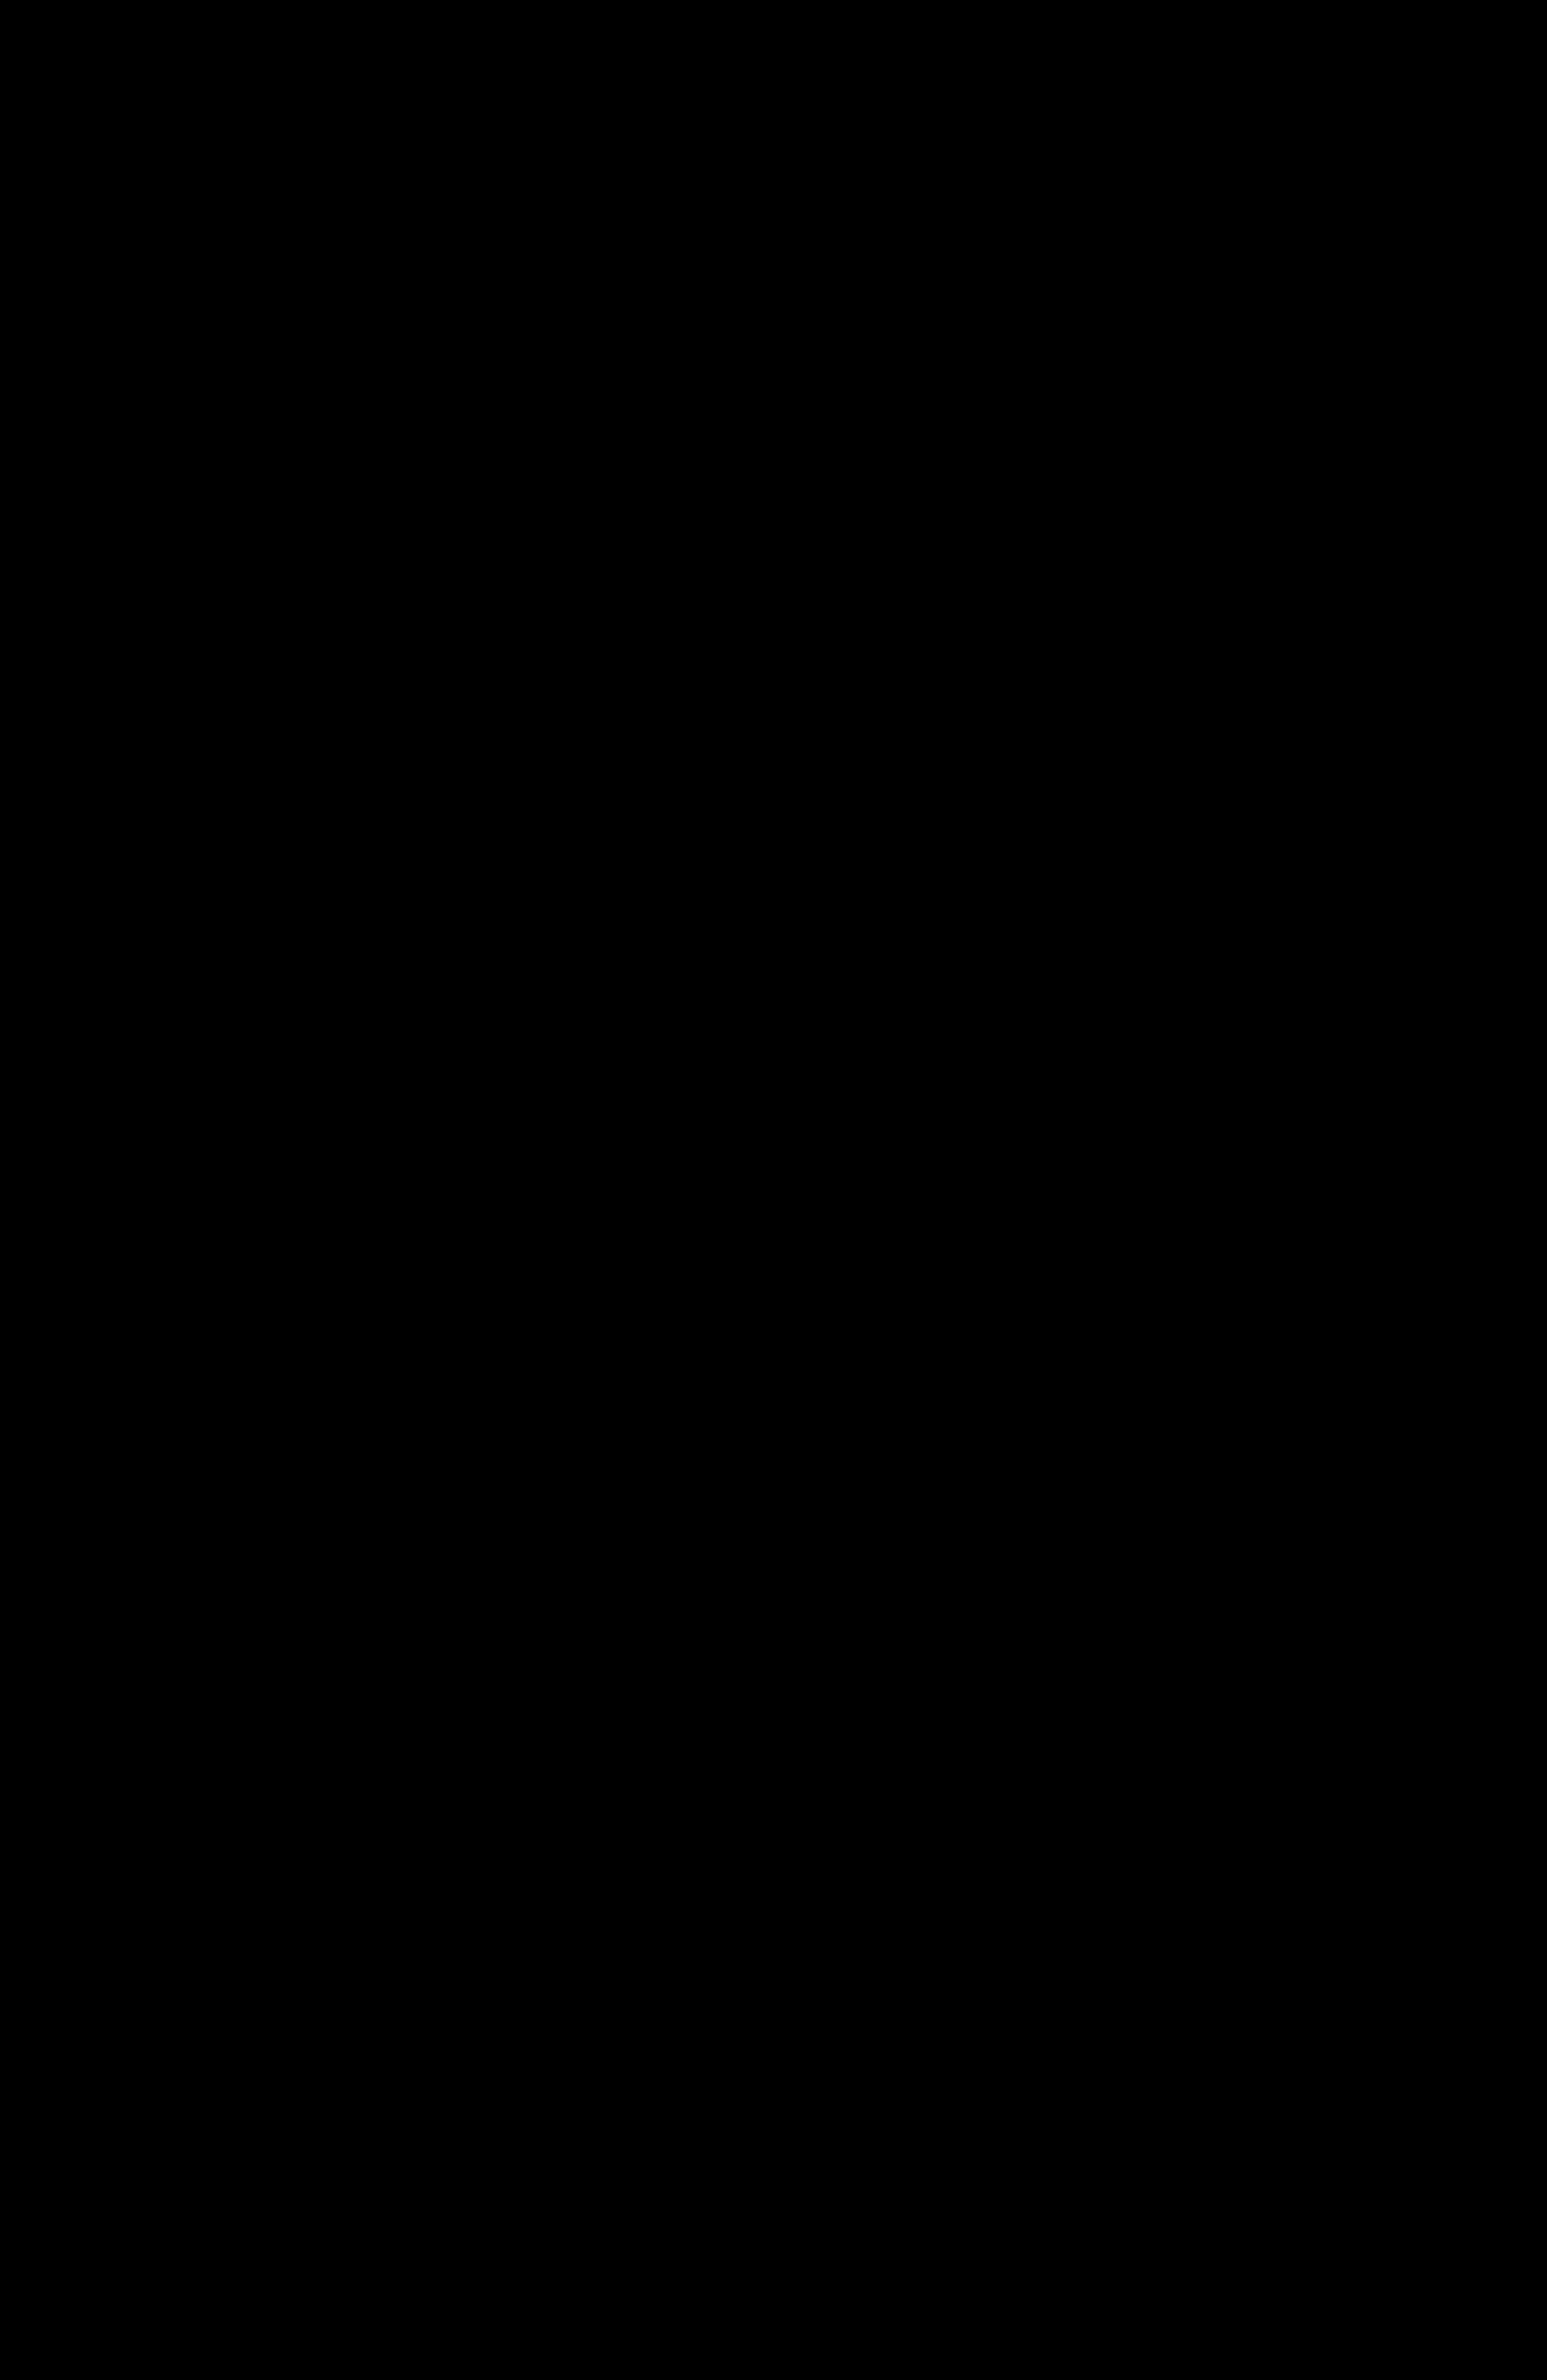 Female silhouette profile at. Clipart brain woman